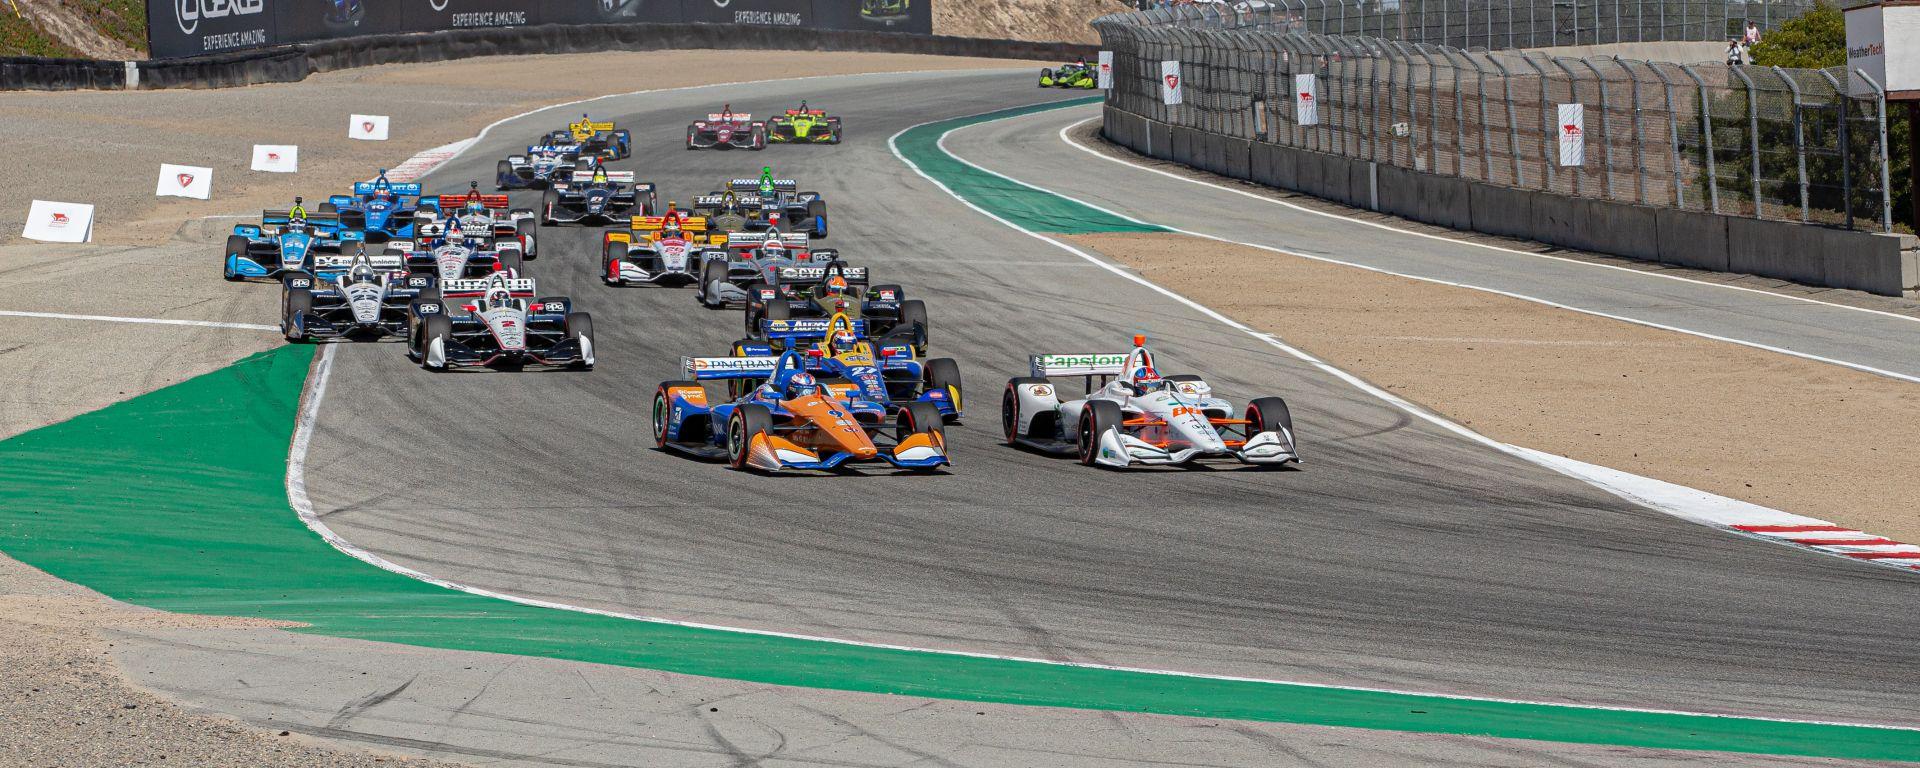 Indycar @ Laguna seca